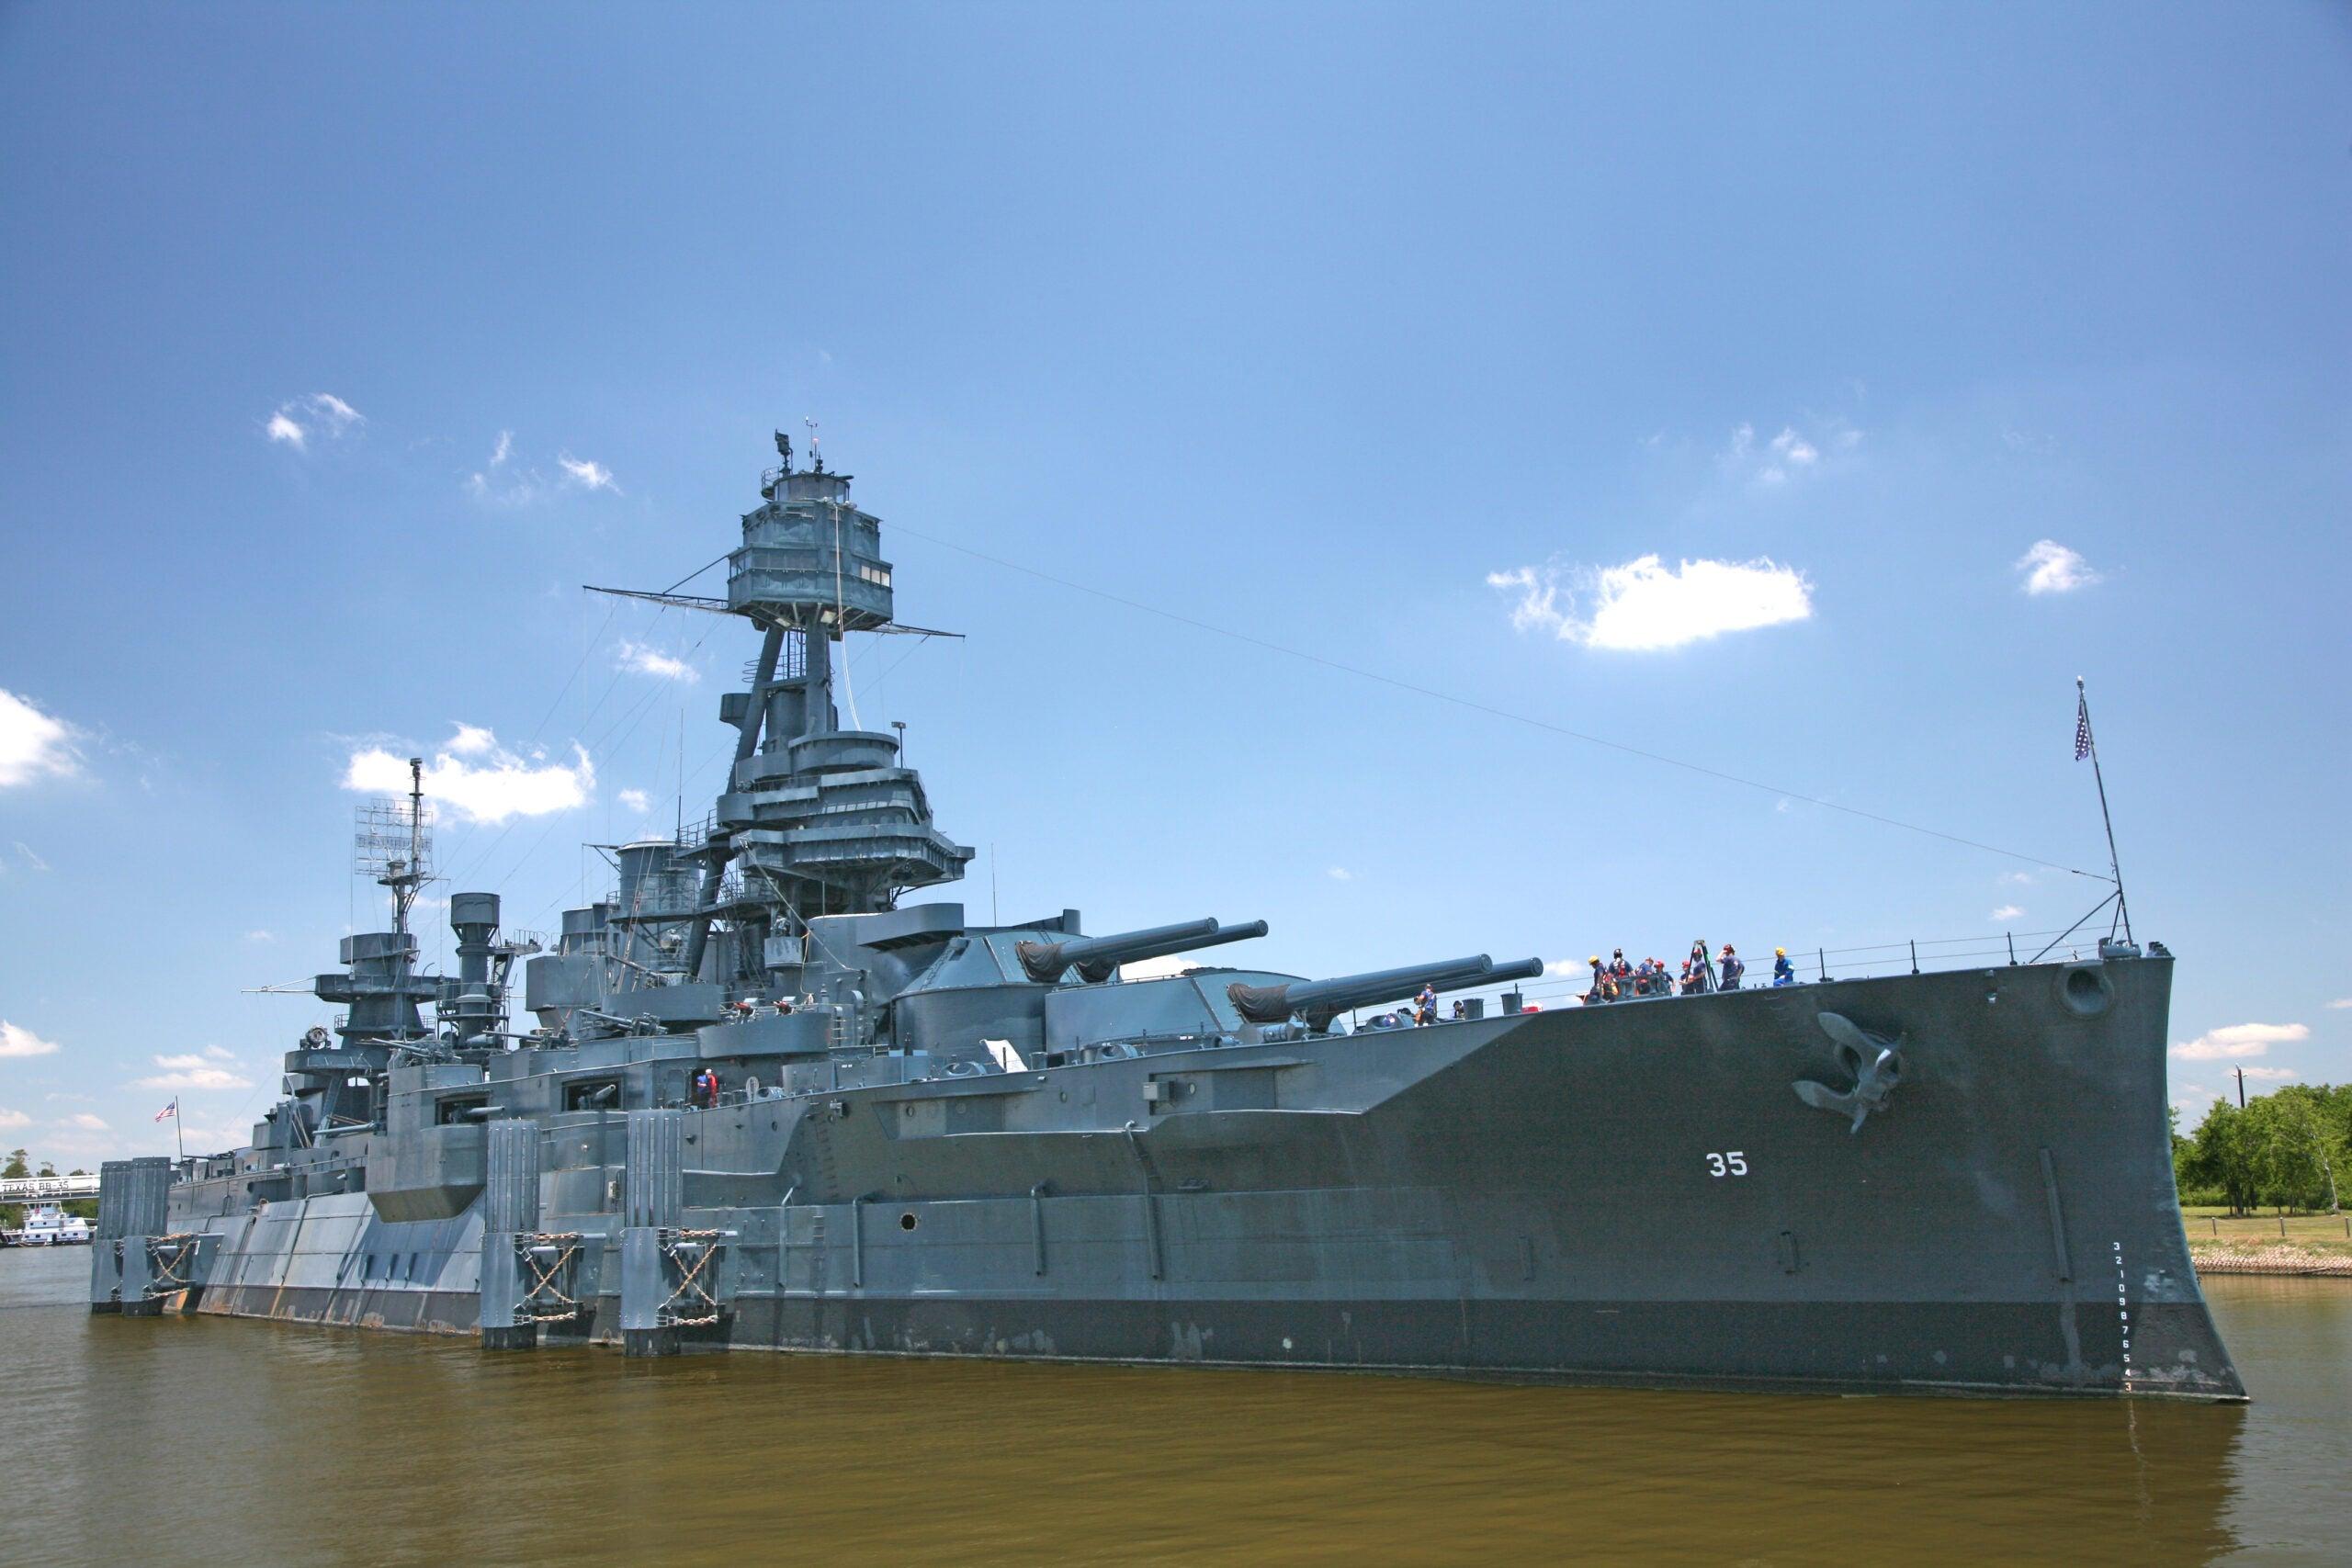 ugly battleship